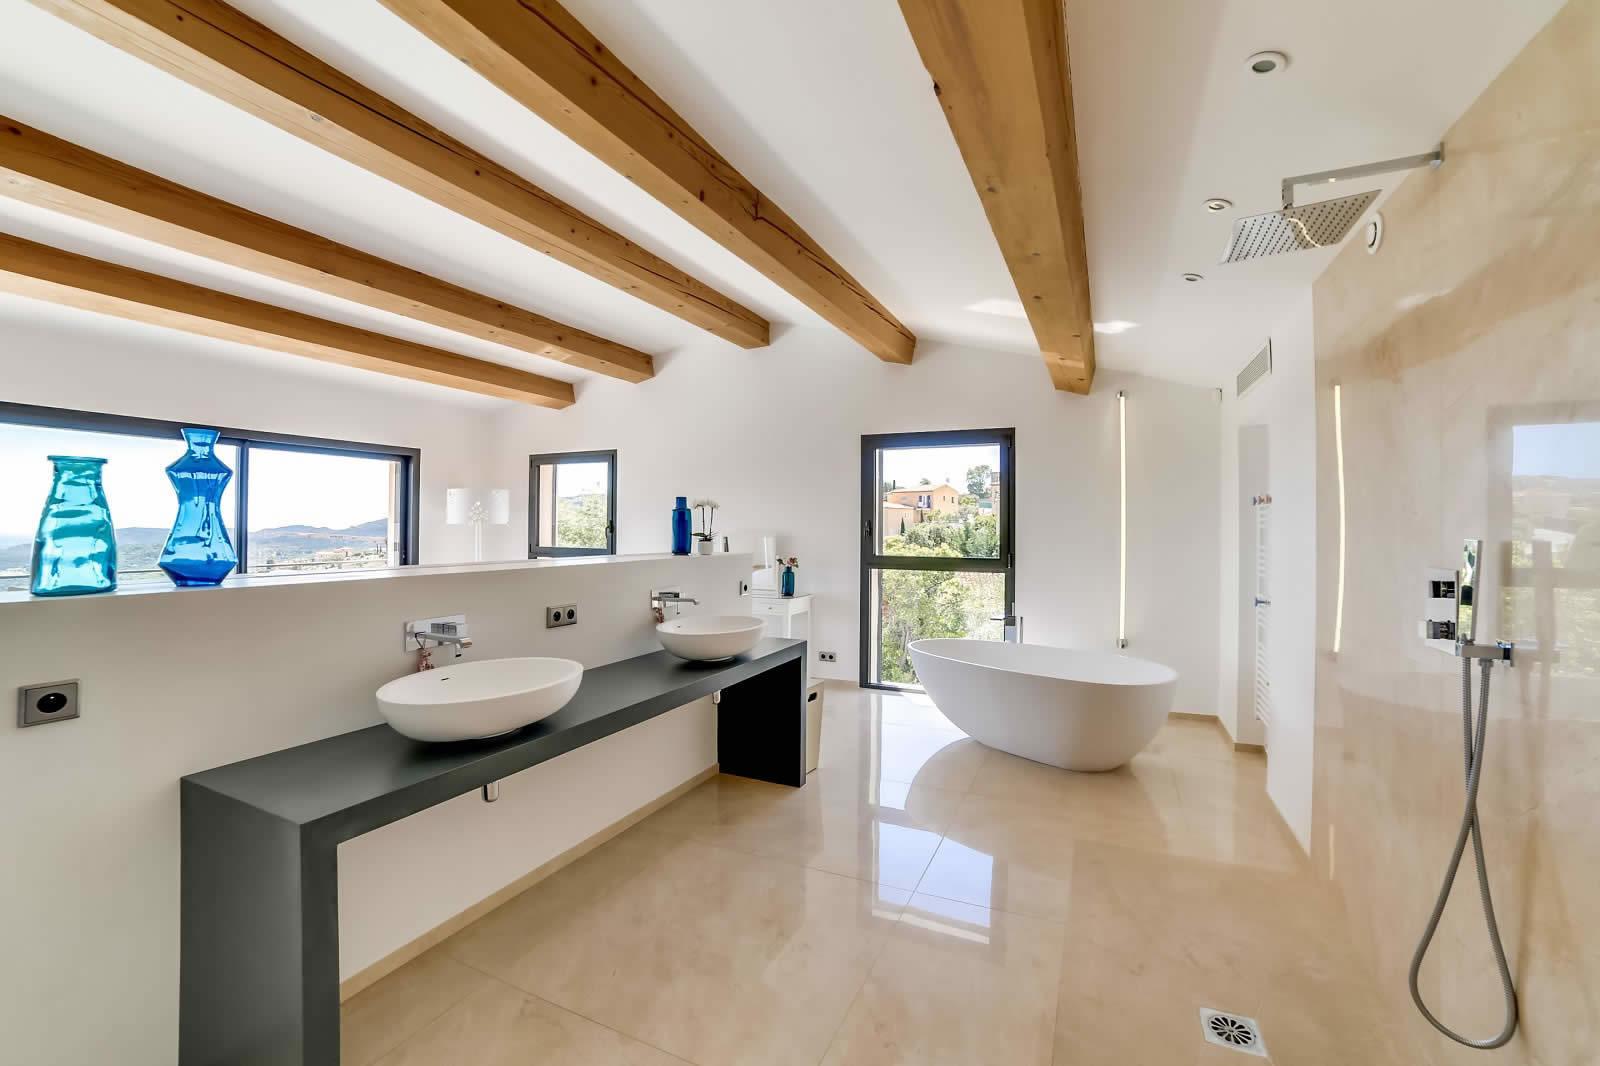 Moderne Villa Avec Vue Mer Piscine Debordement Chauffe